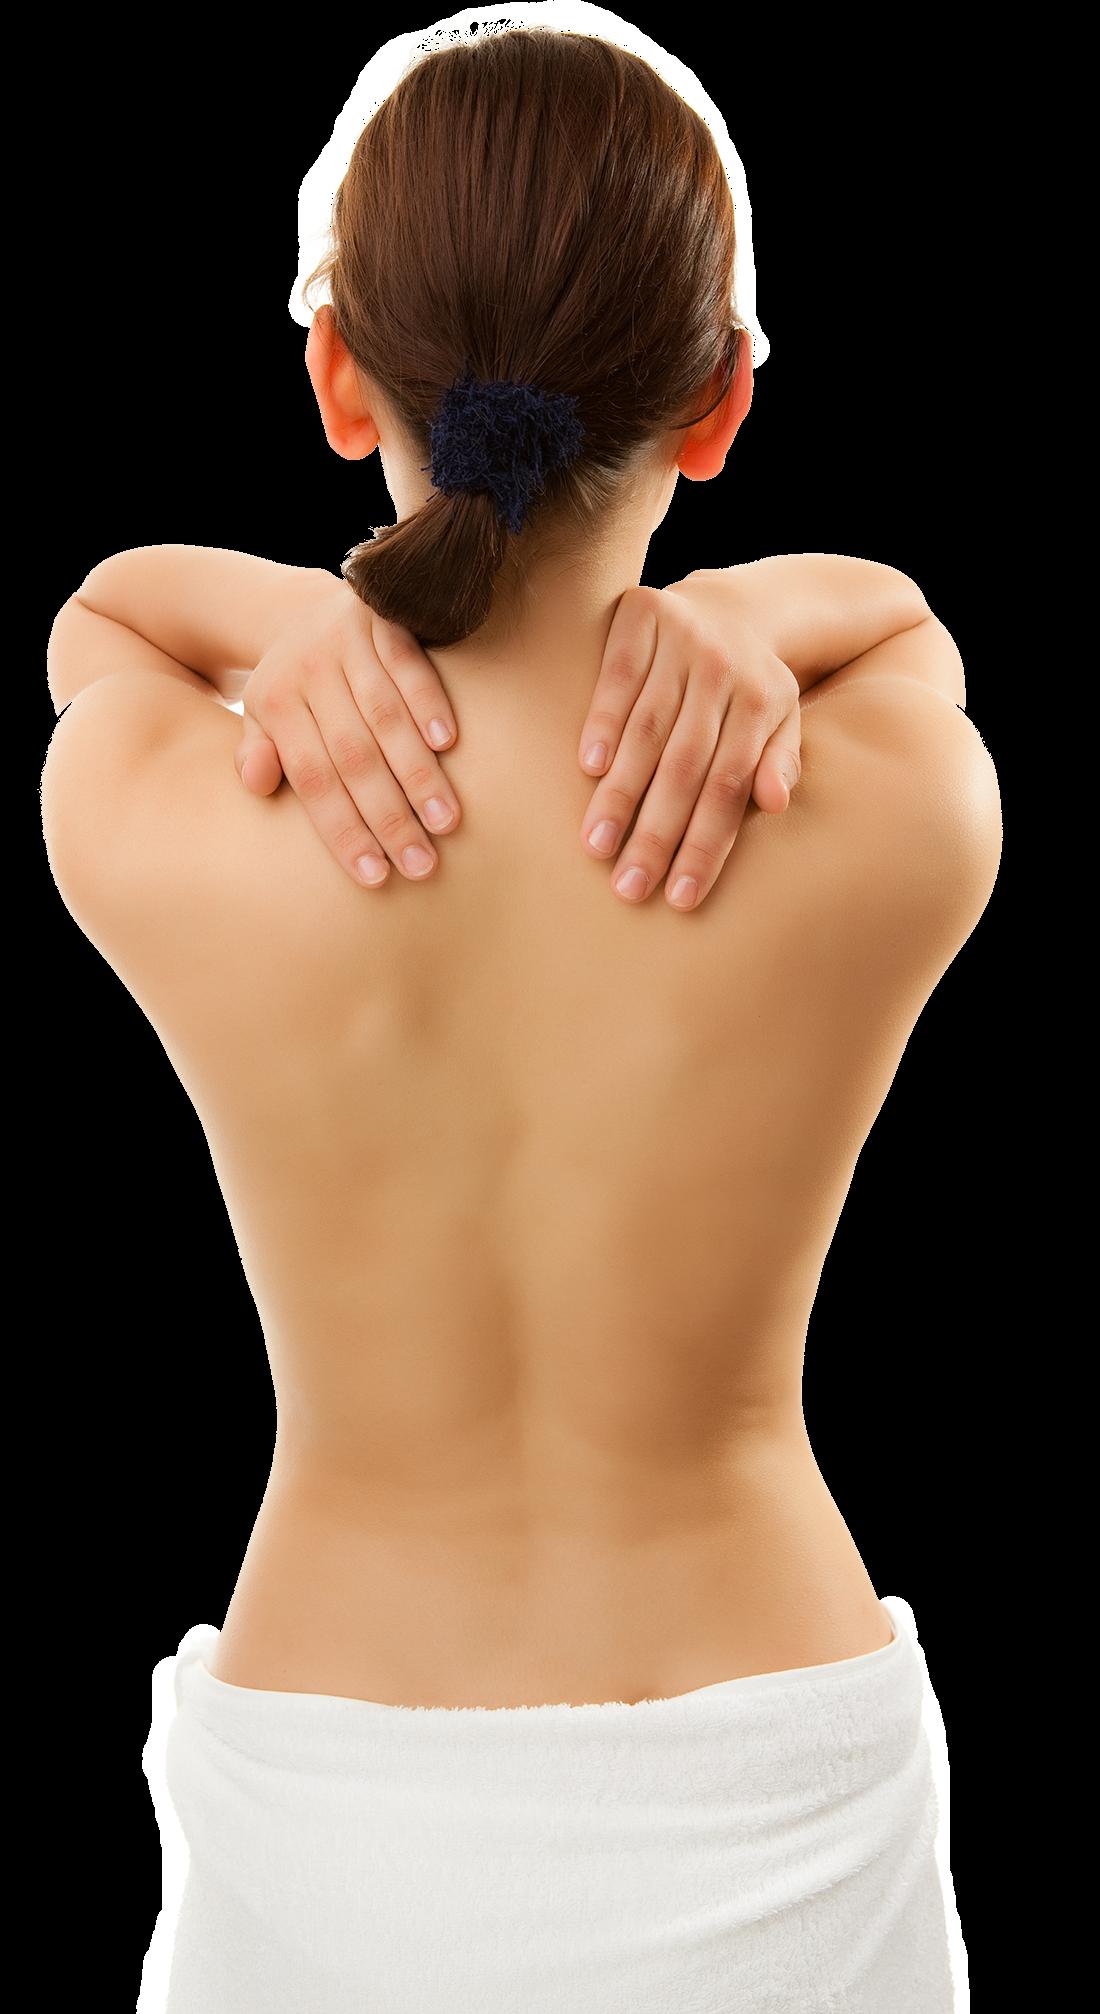 Skin clipart back body. Sculpting tighten your apple